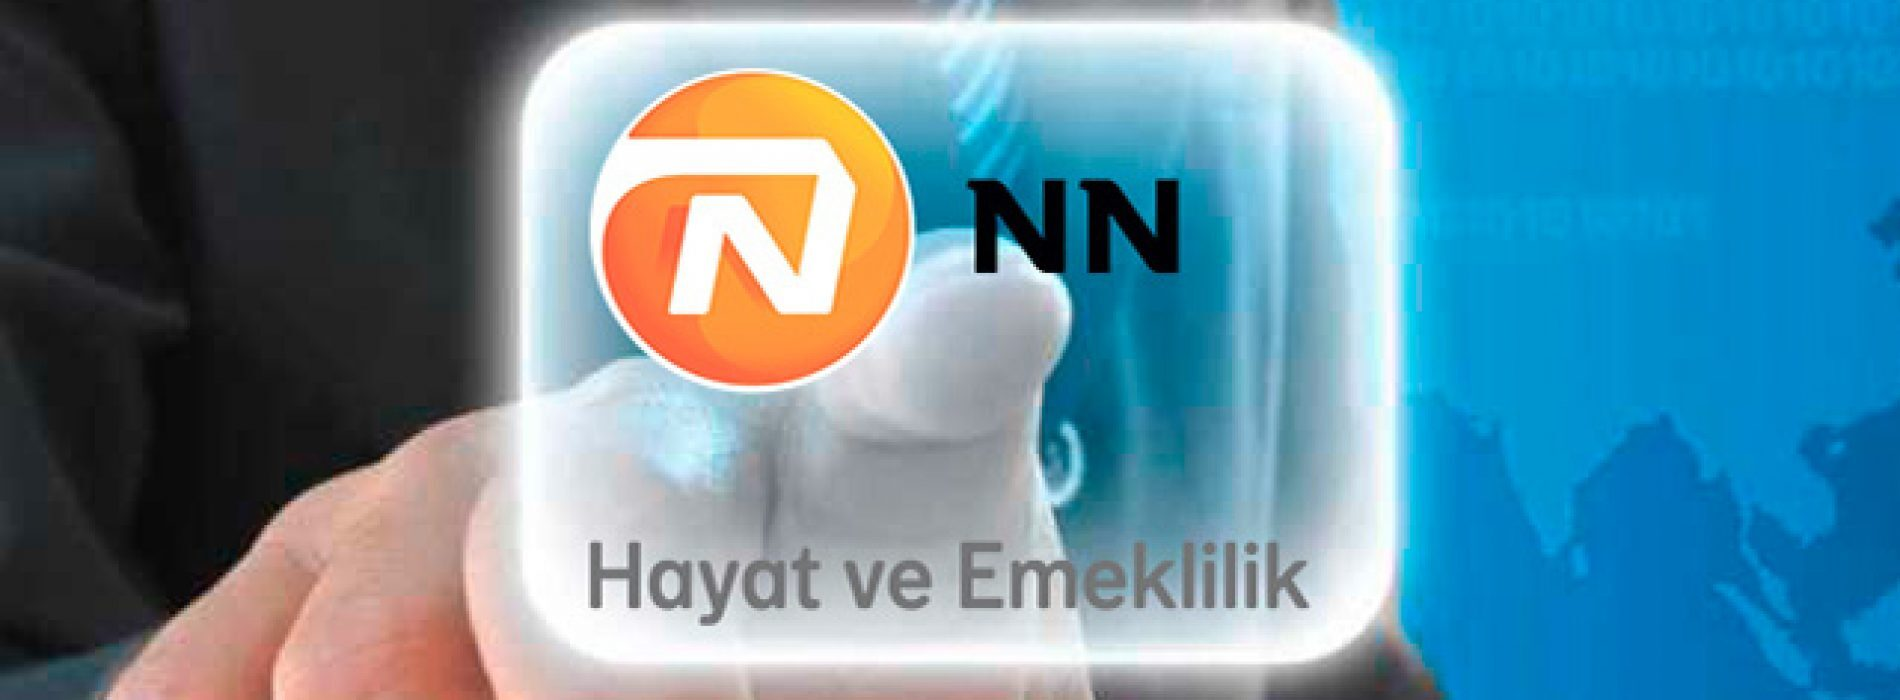 NN Group preferred Aksoy Research